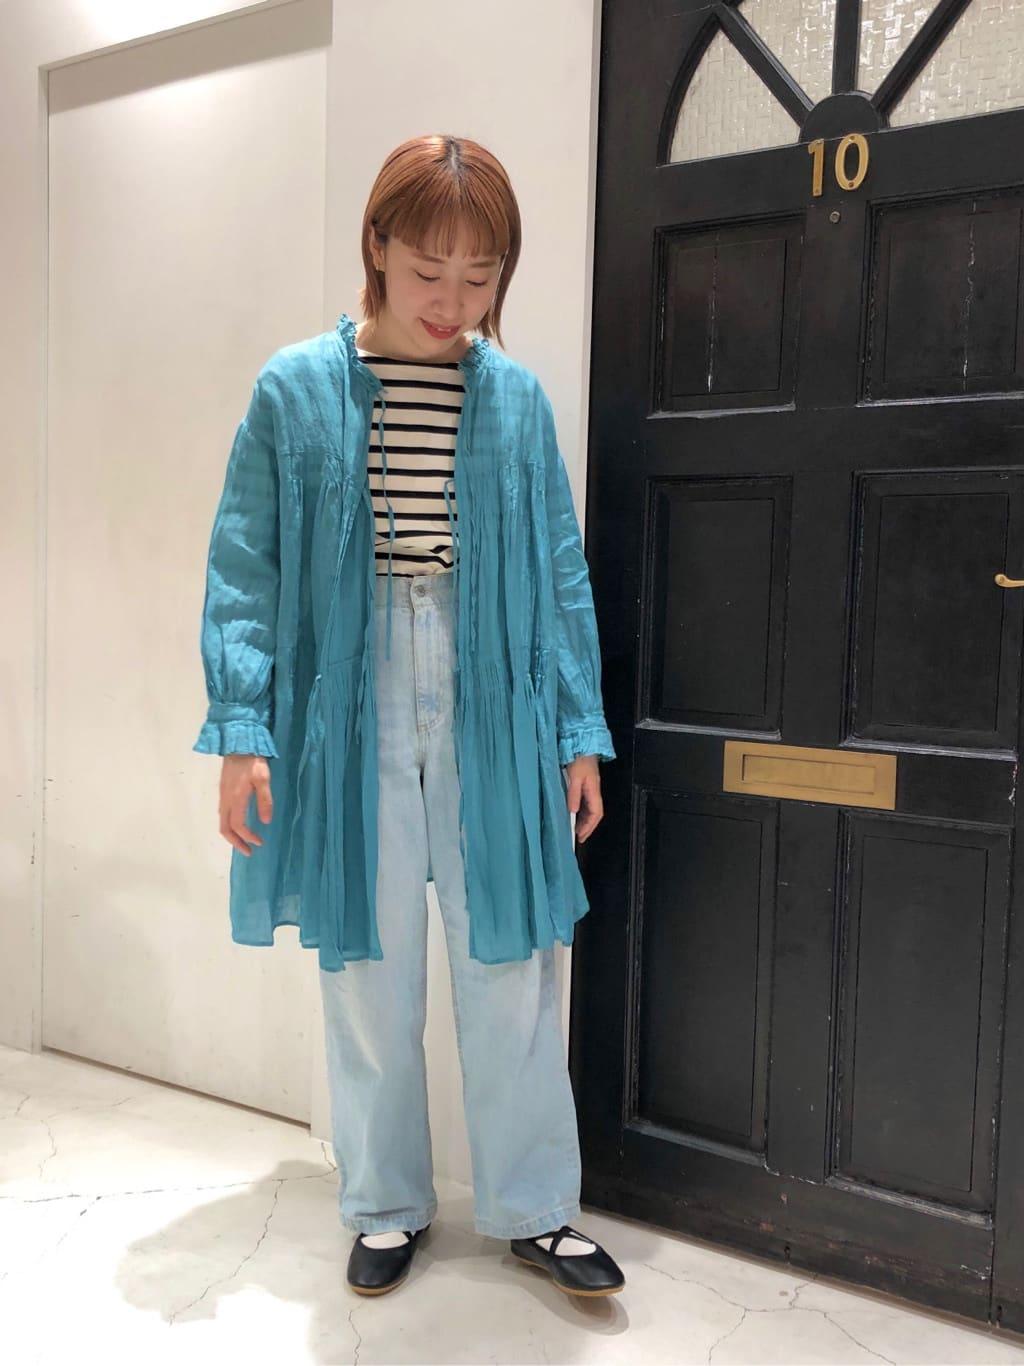 Dot and Stripes CHILD WOMAN ルクアイーレ 身長:157cm 2021.07.01